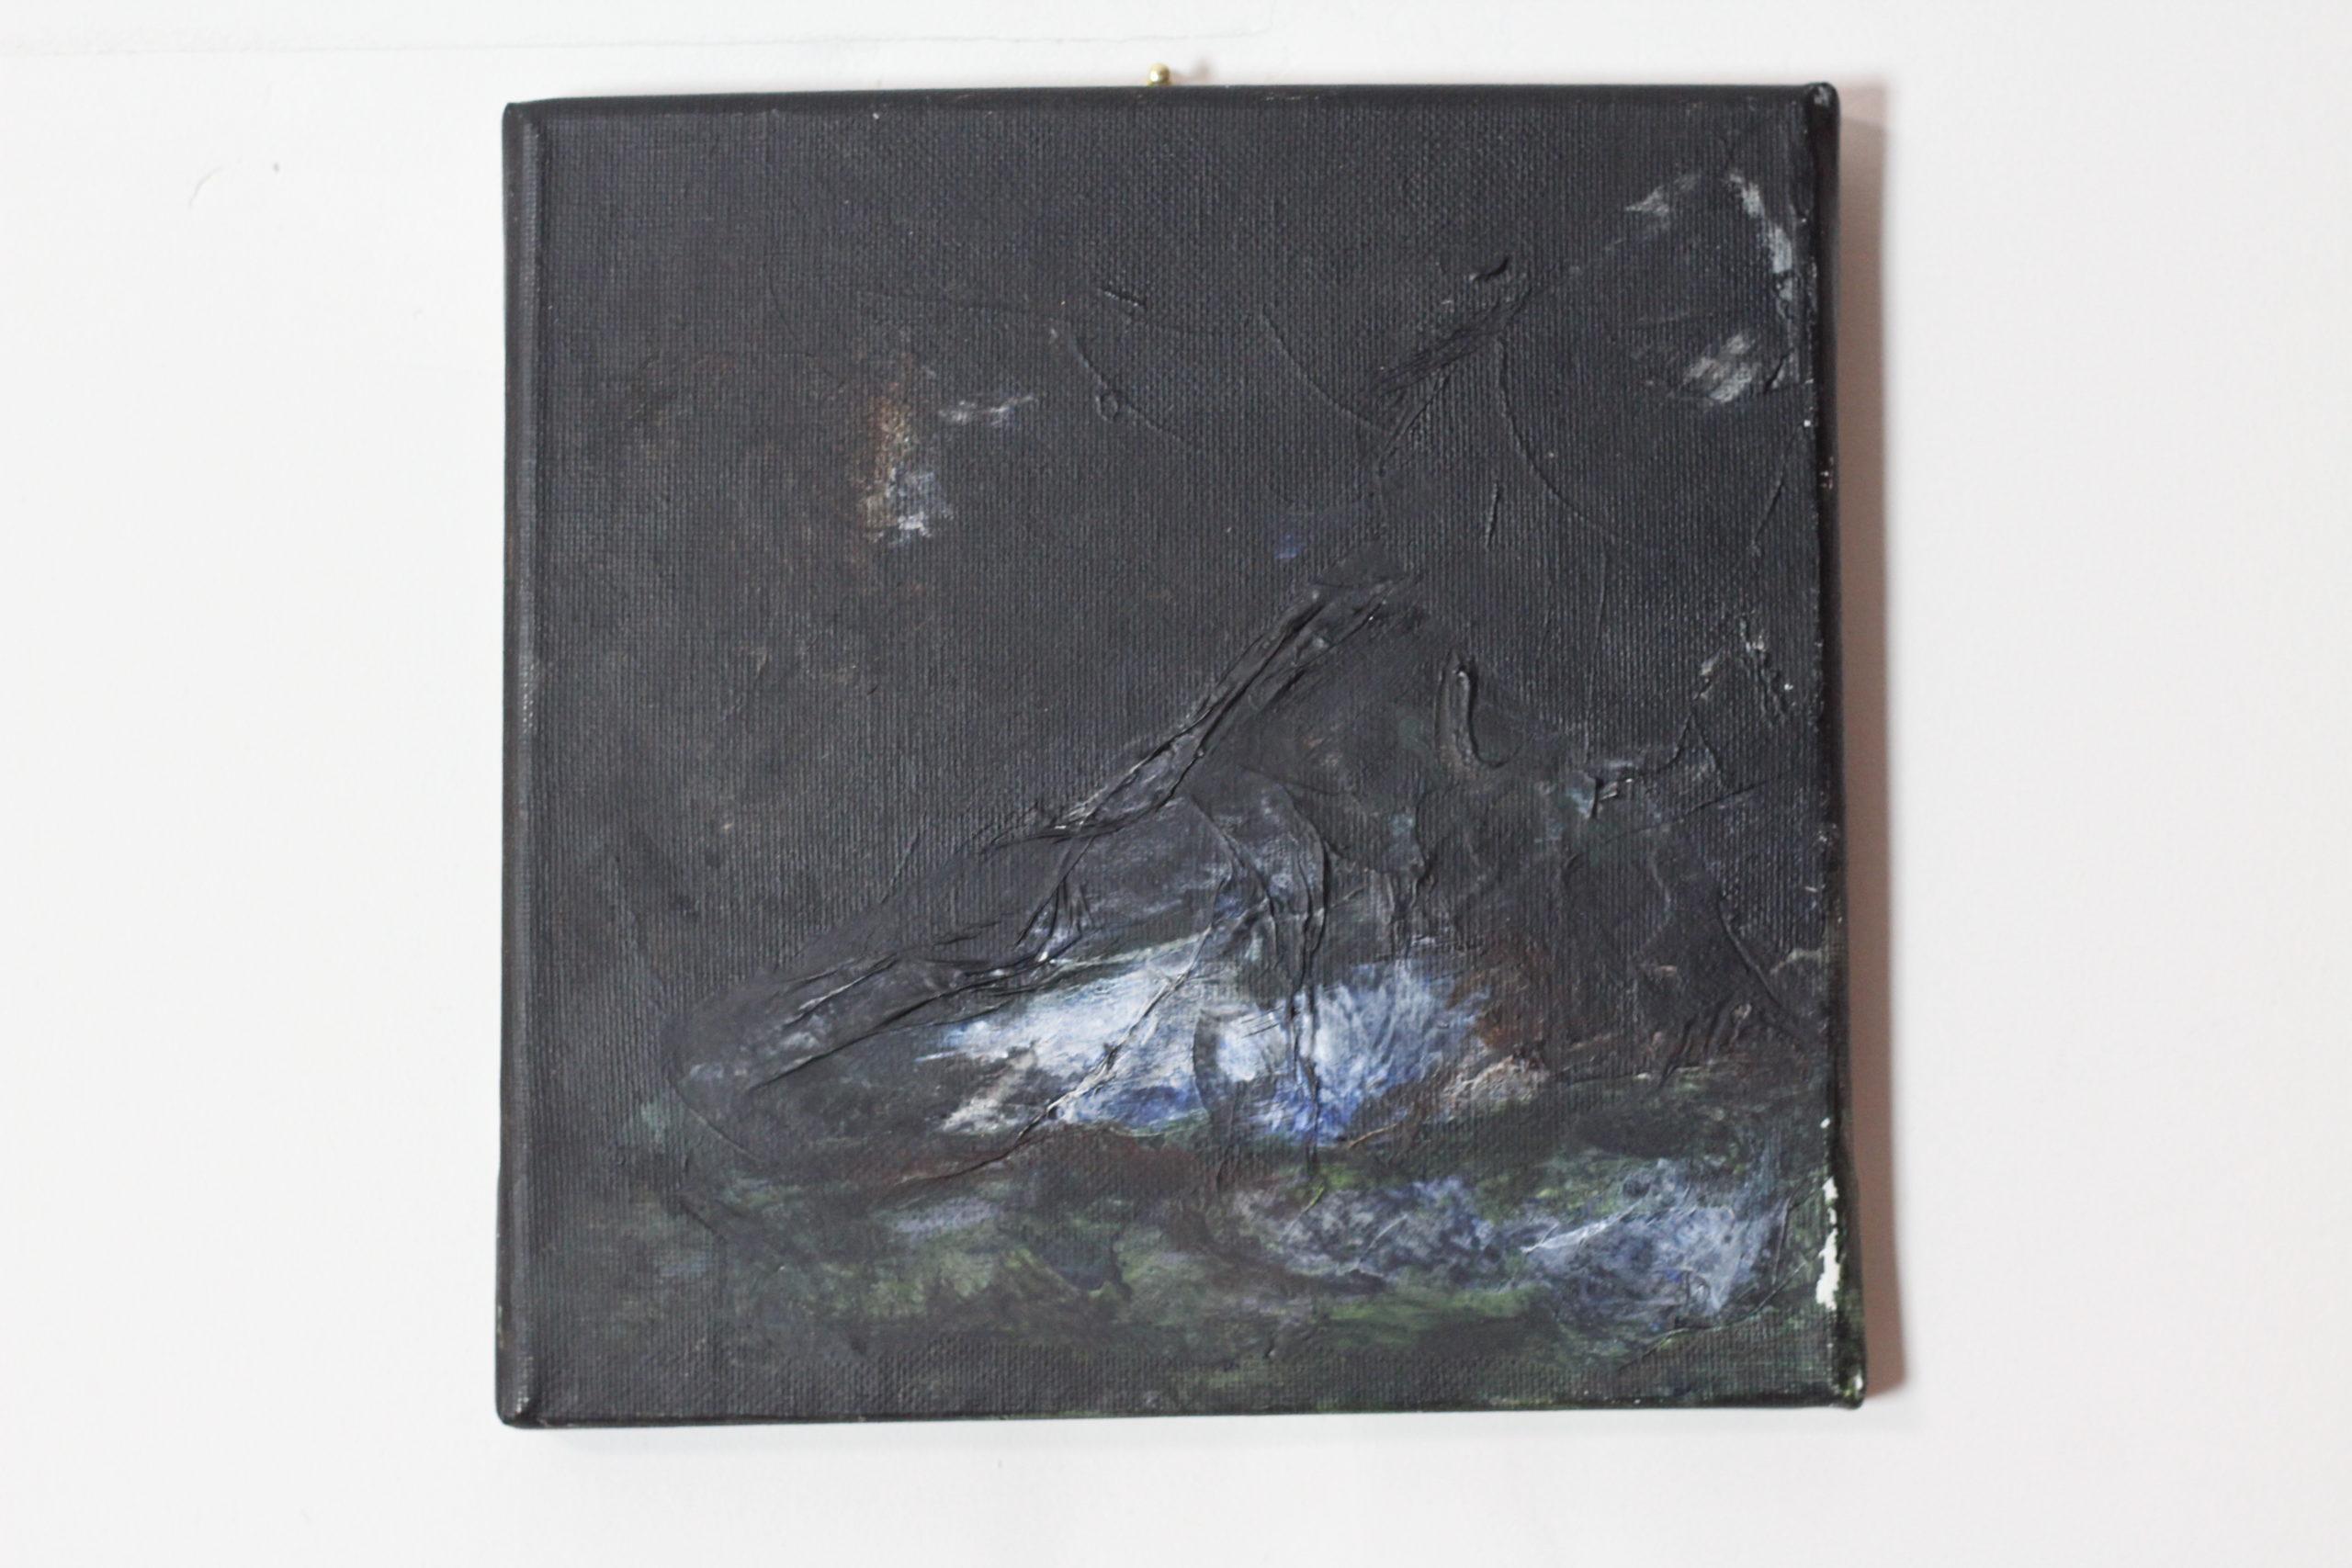 Peinture : Nature 5 20x20 (Véronique Fuchs-Sublon)